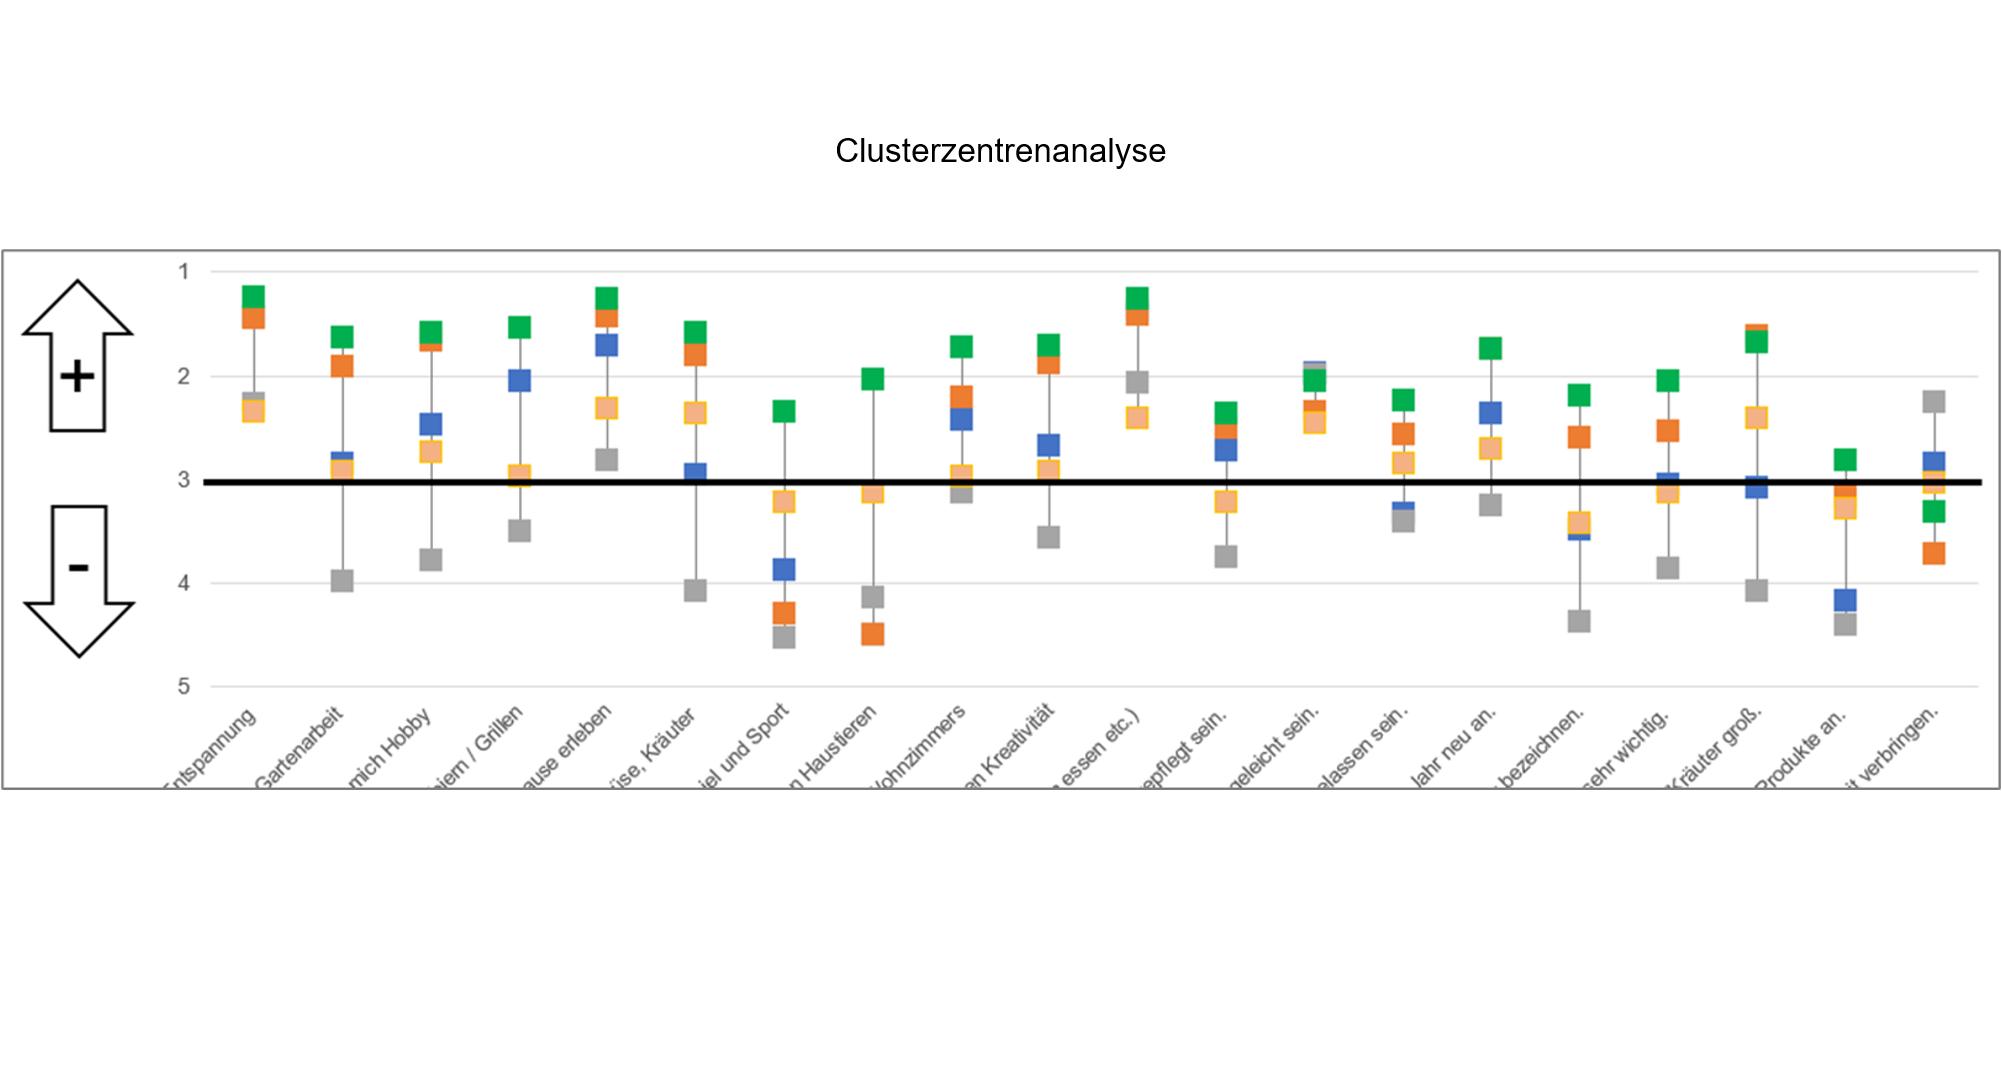 B2C Clusterzentrenanalyse